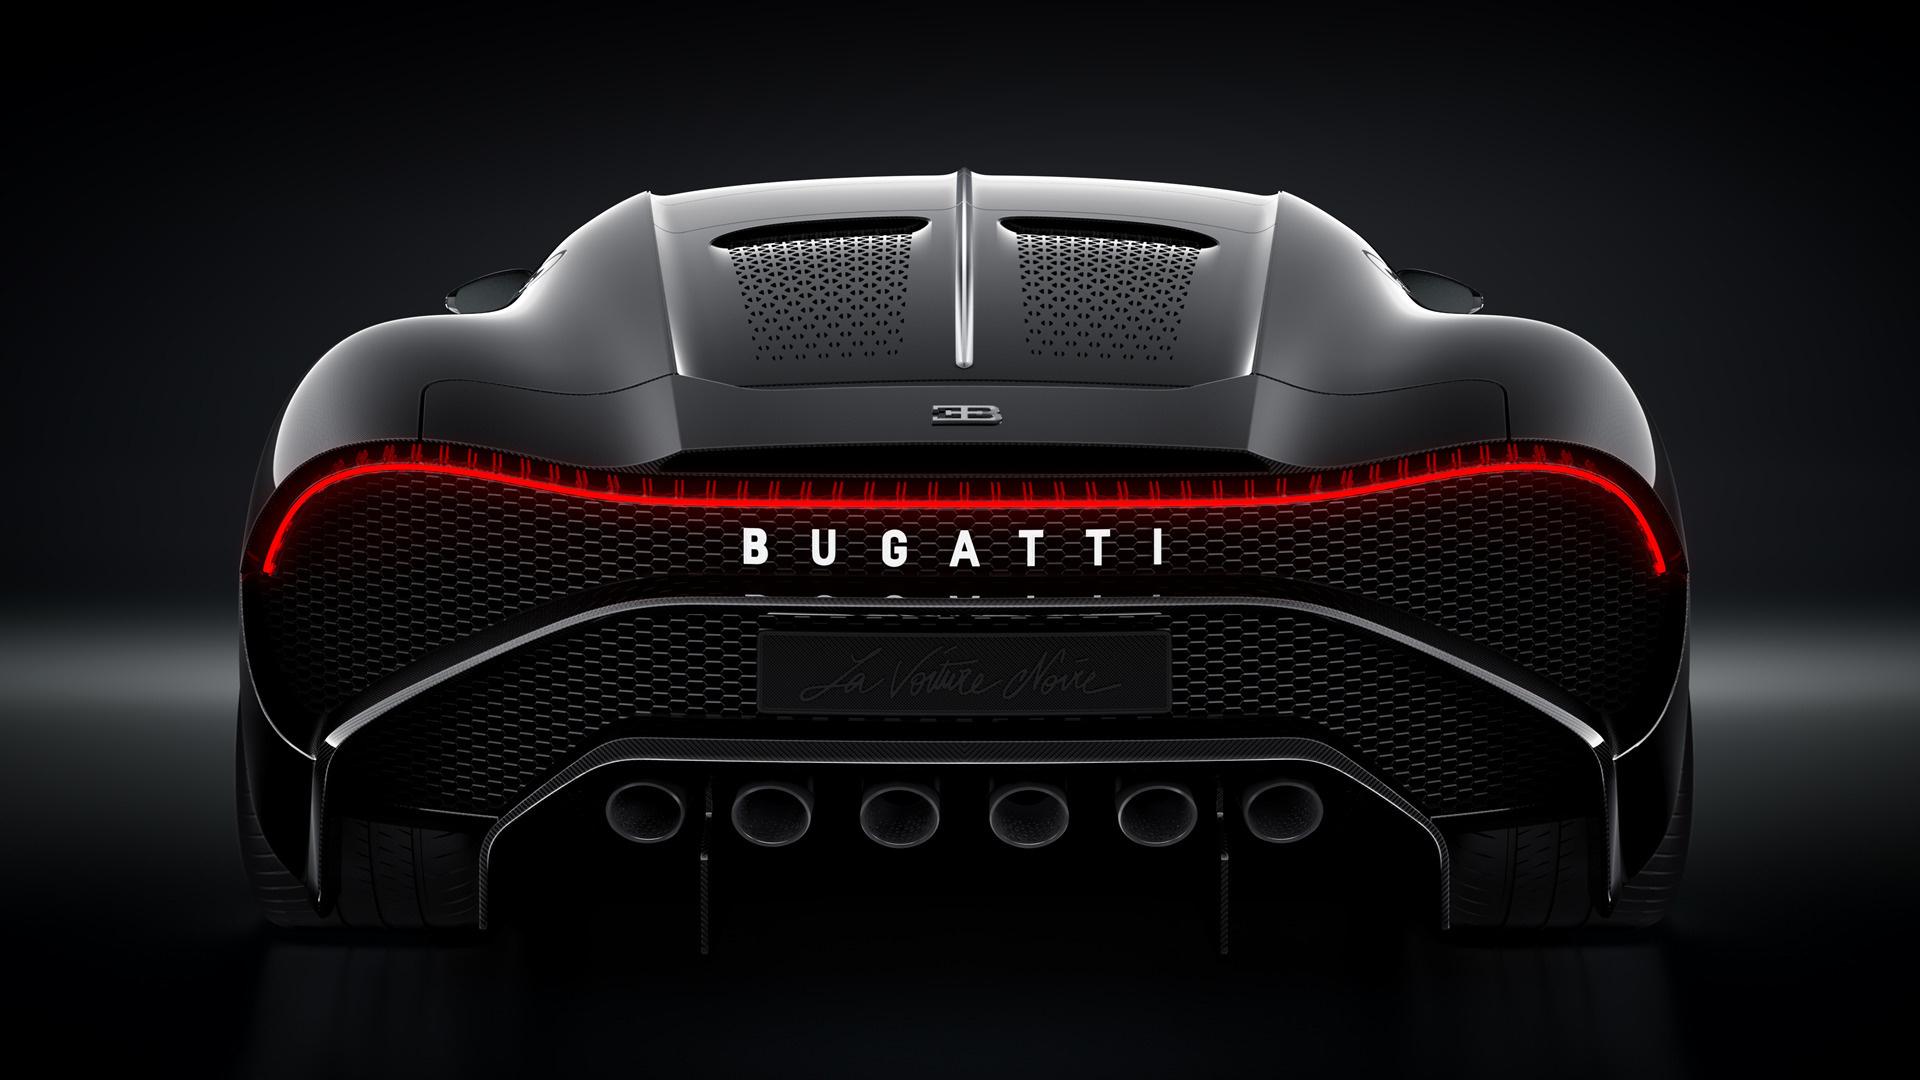 2019 Bugatti La Voiture Noire Wallpapers And Hd Images